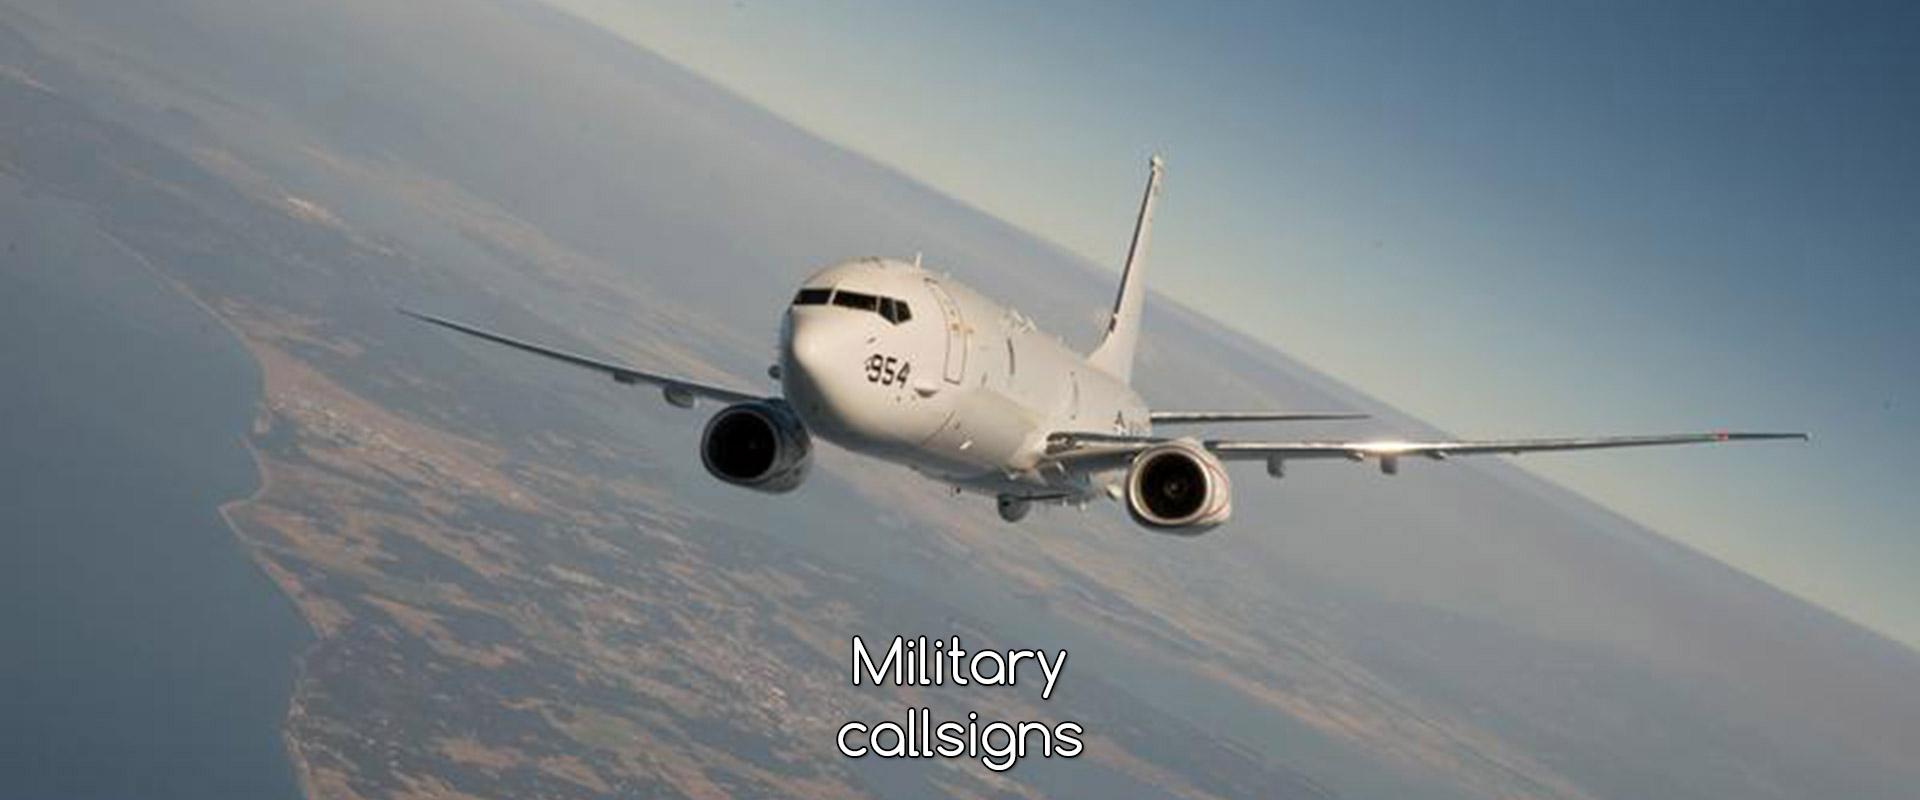 Military Callsigns